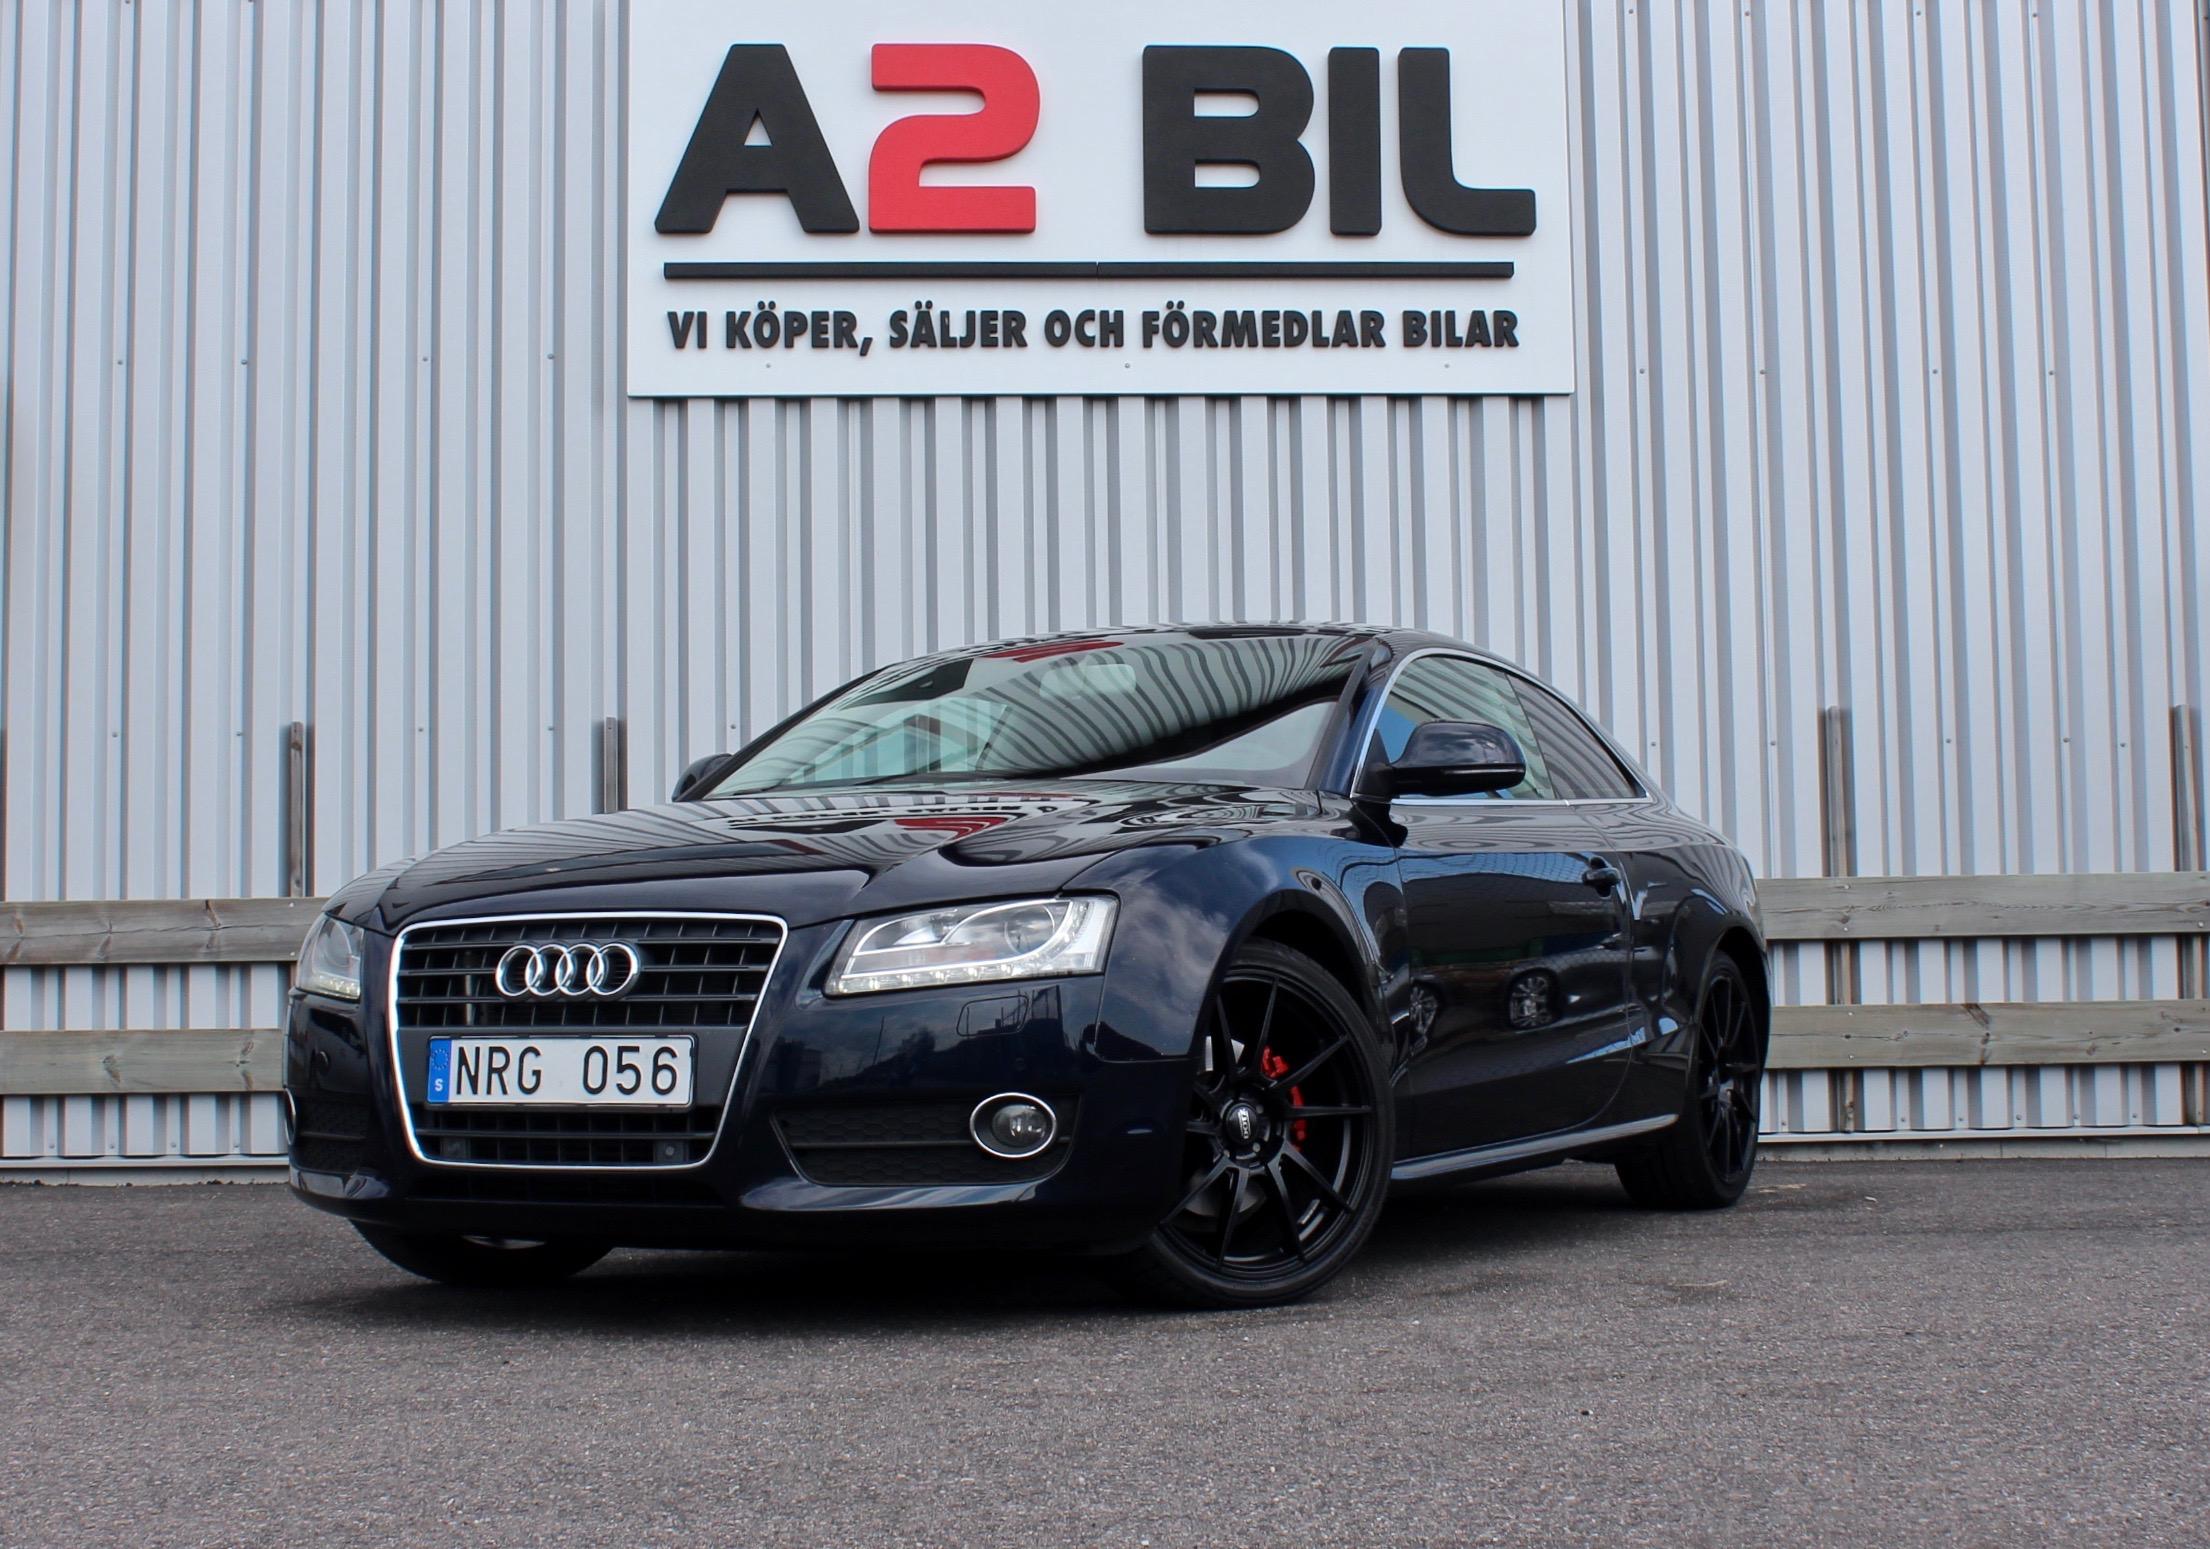 Audi A5 Coupé 2.0 TFSI Automat 180hk